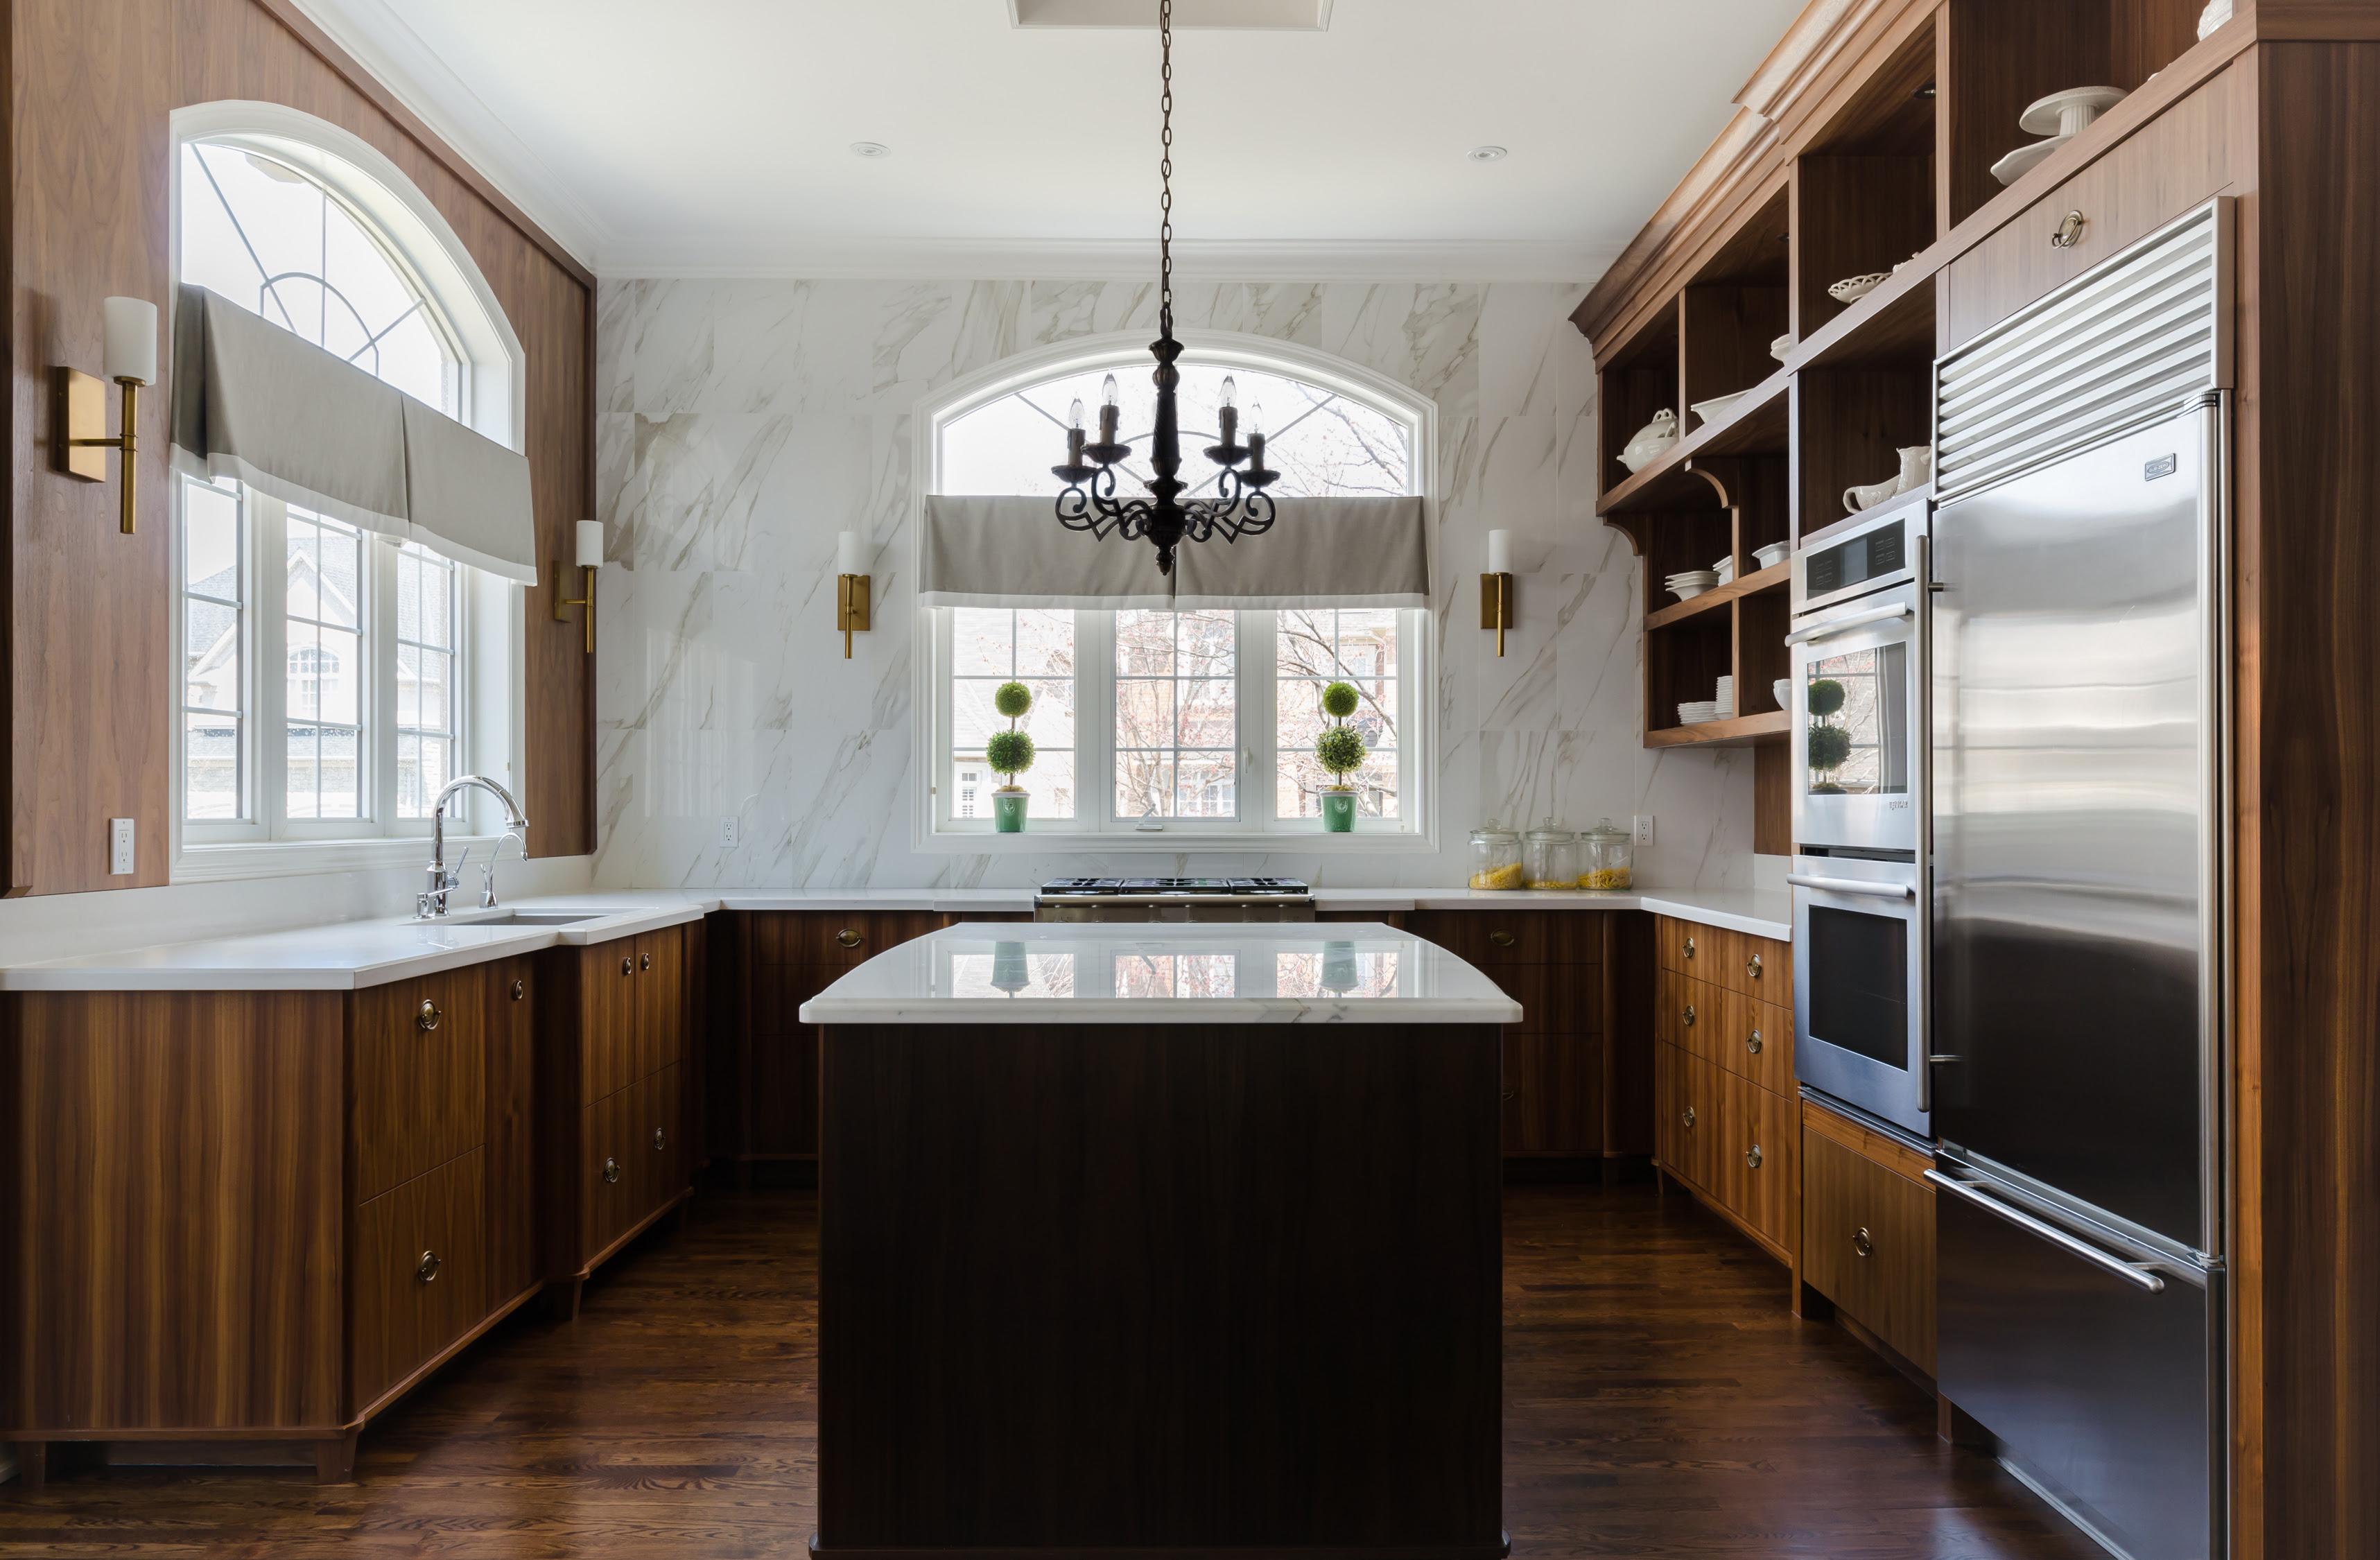 Interior Design Show January 2124, 2016, Toronto Misani Custom Design - Show Home Interior Design, Budget, Designers Interior Design